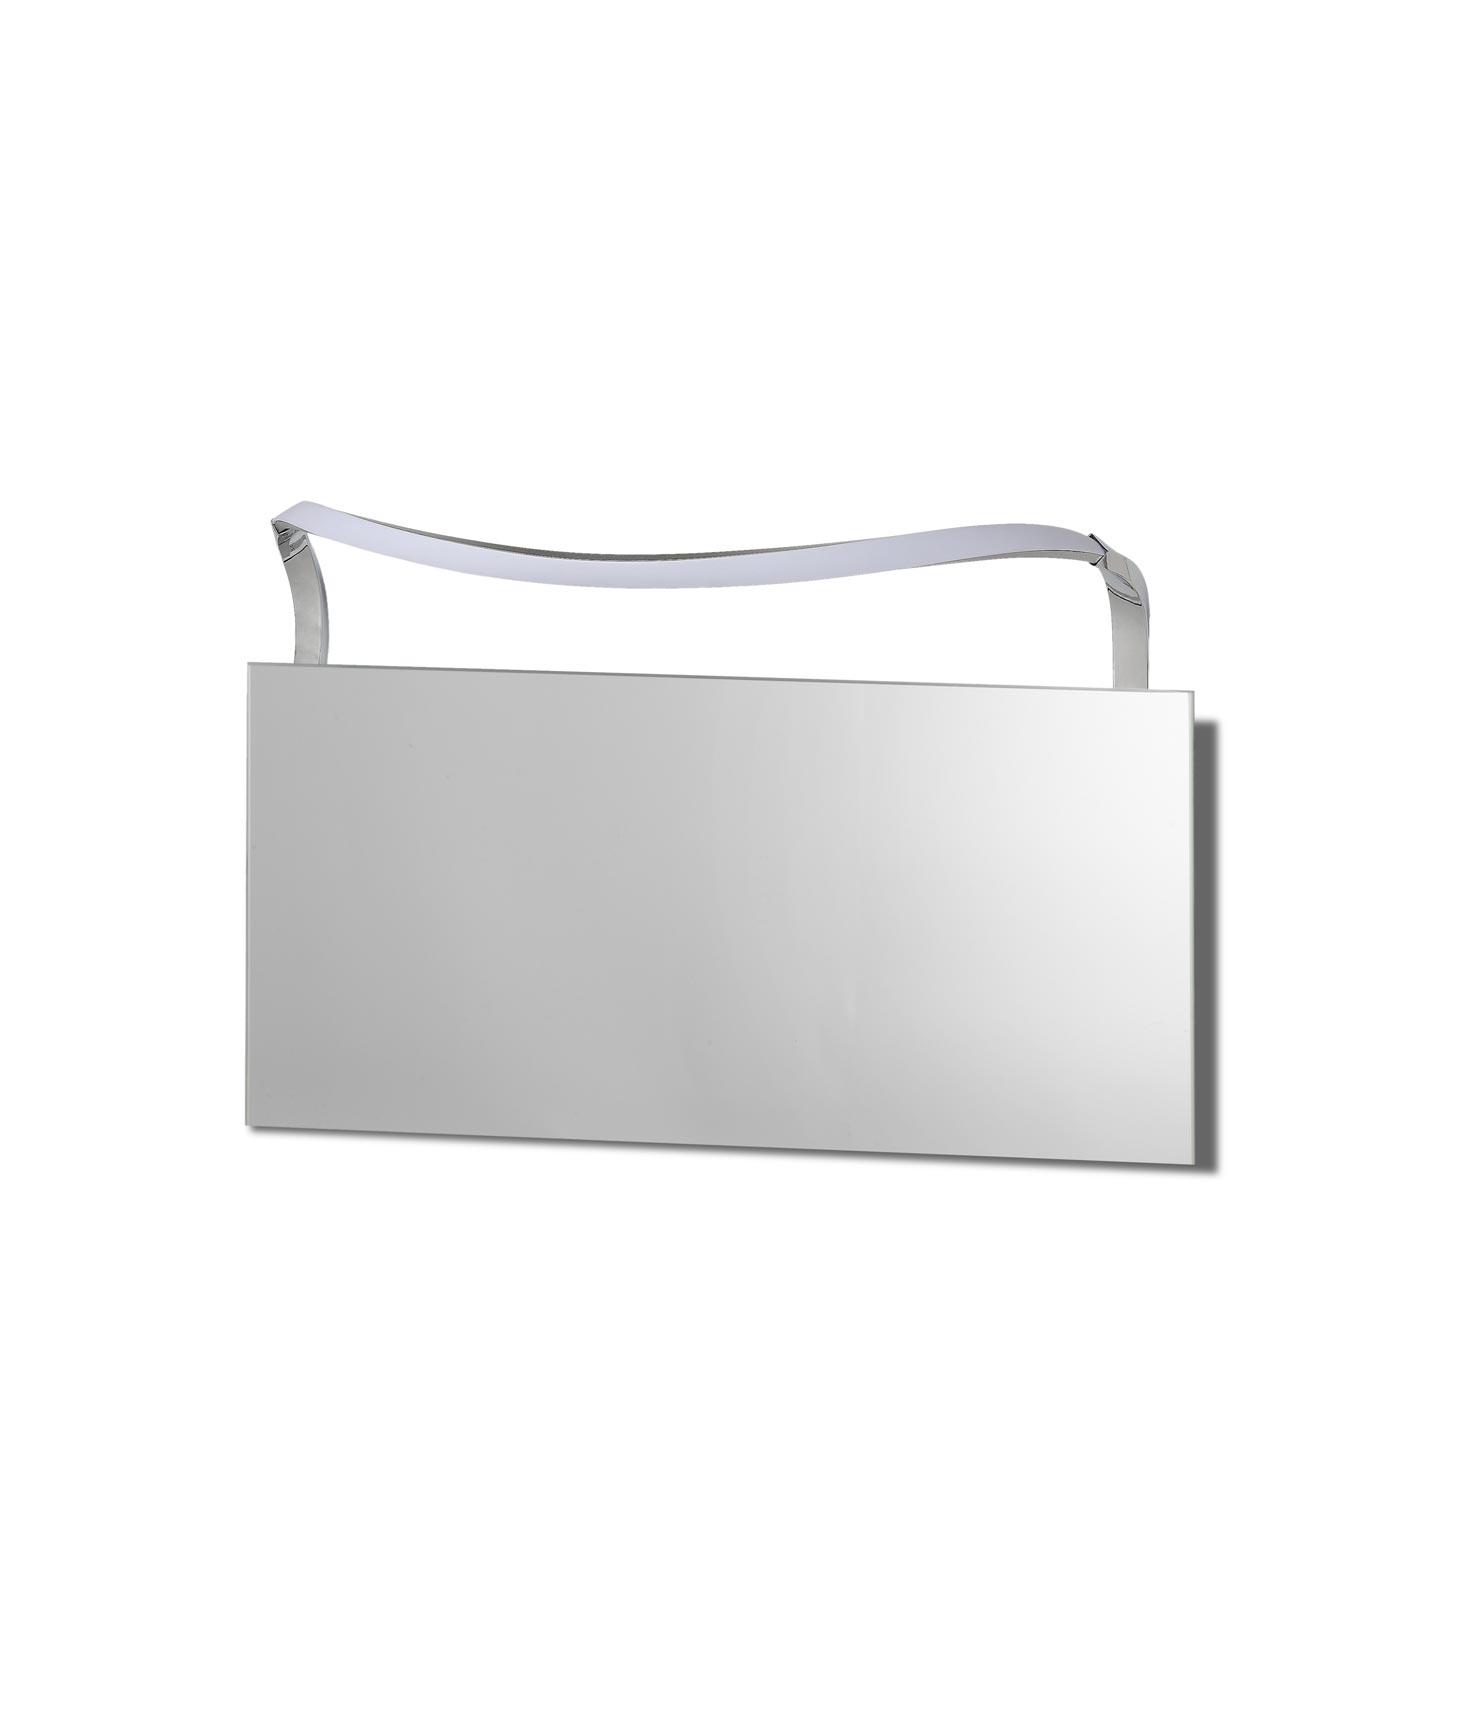 Aplique baño ondas grande SISLEY plata cromo